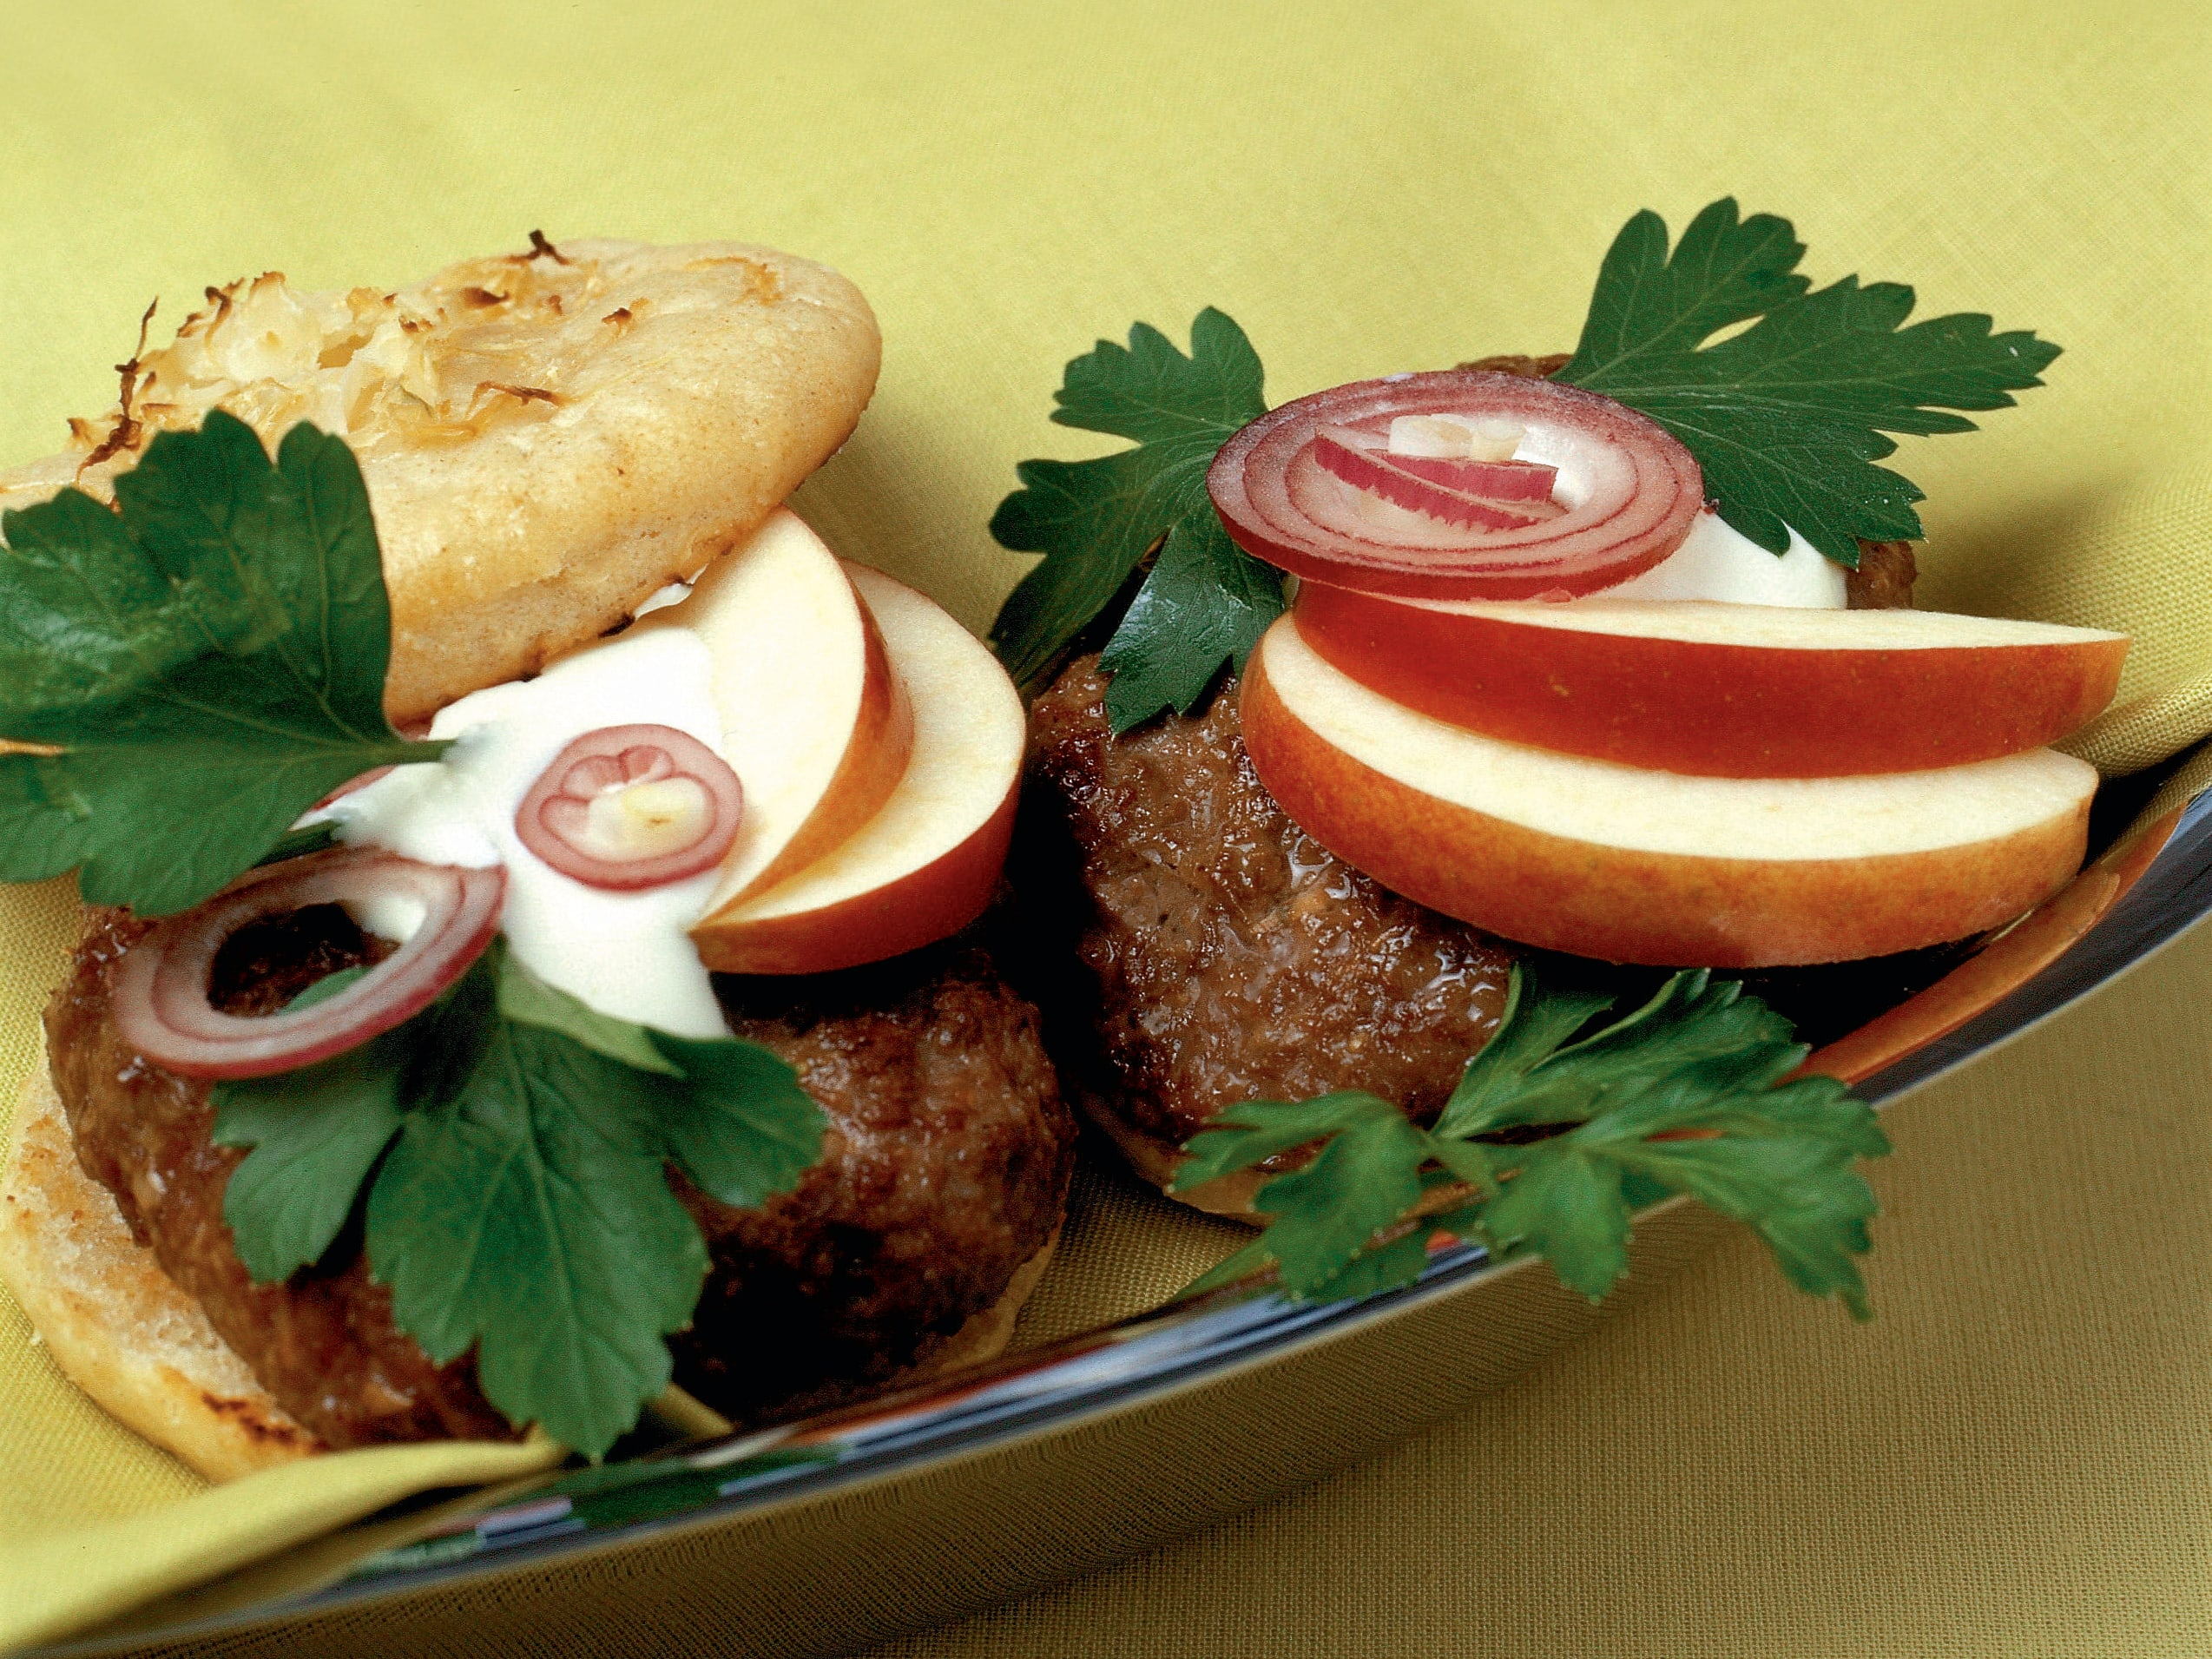 Hamburger in Sauerkrautbrötchen